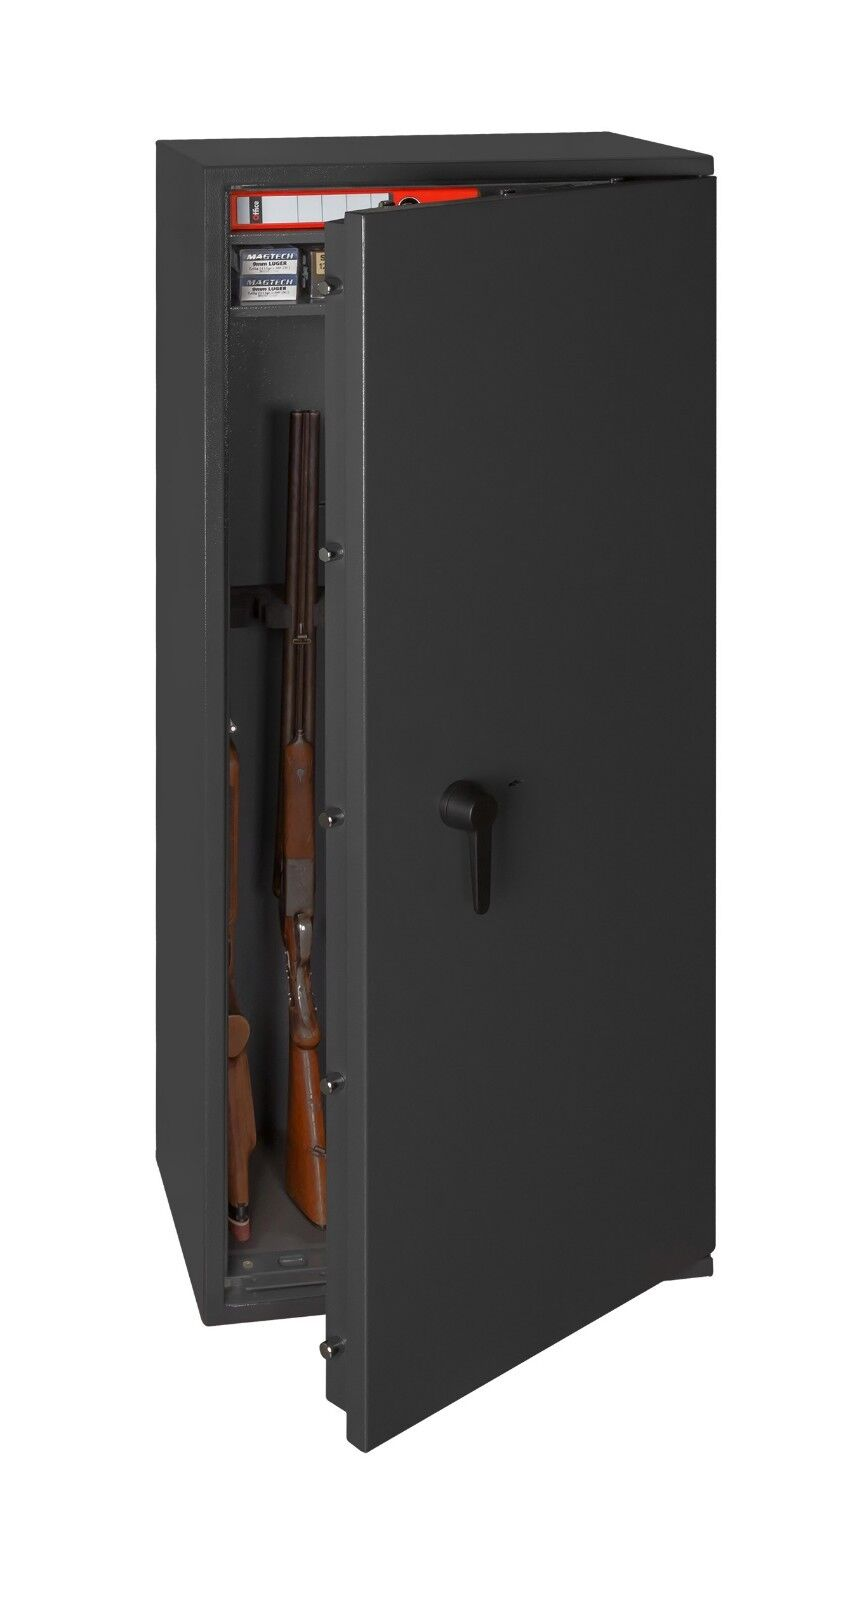 Waffenschrank Waffentresor Grad 1 En I 1143 1 Klasse I En Gun Safe